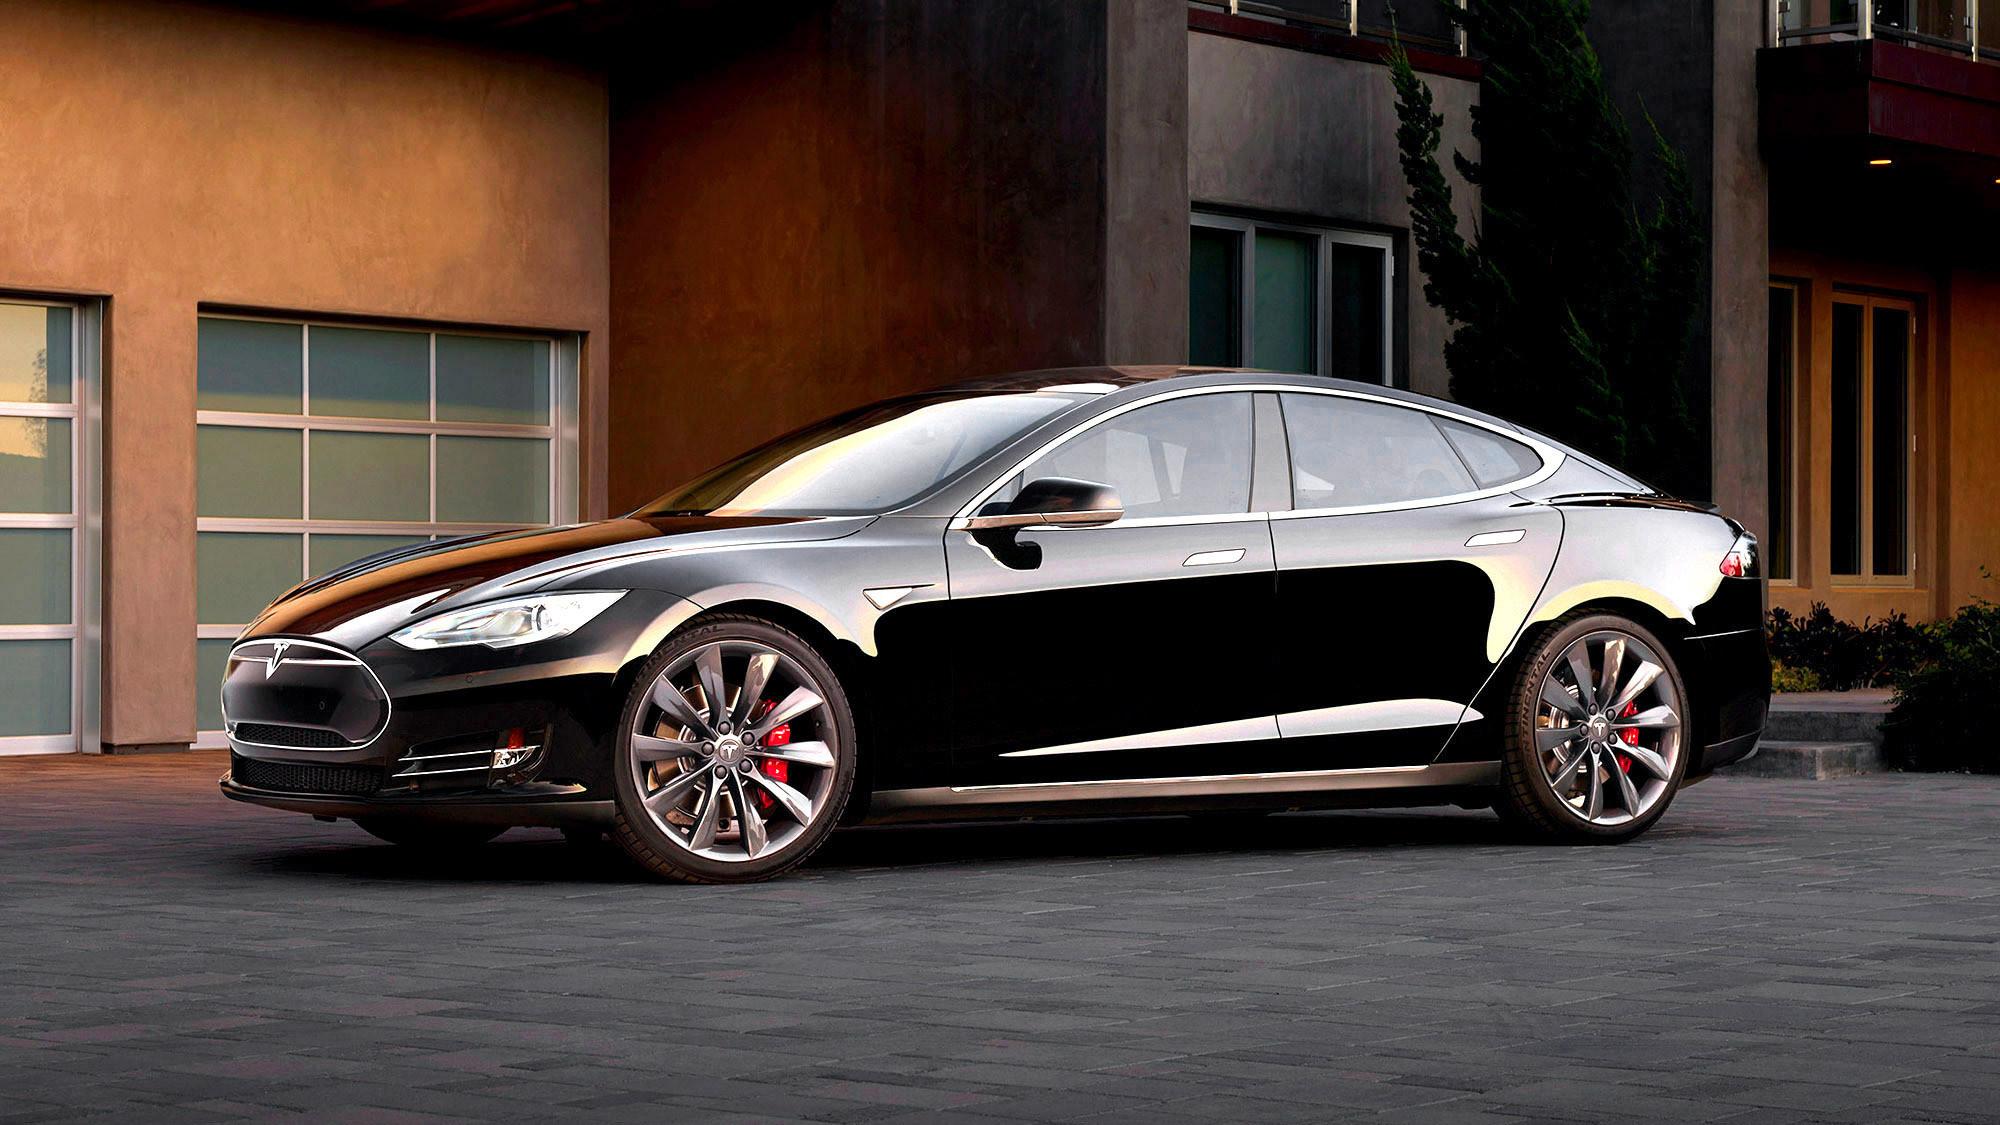 Design of tesla car - Design Of Tesla Car 63